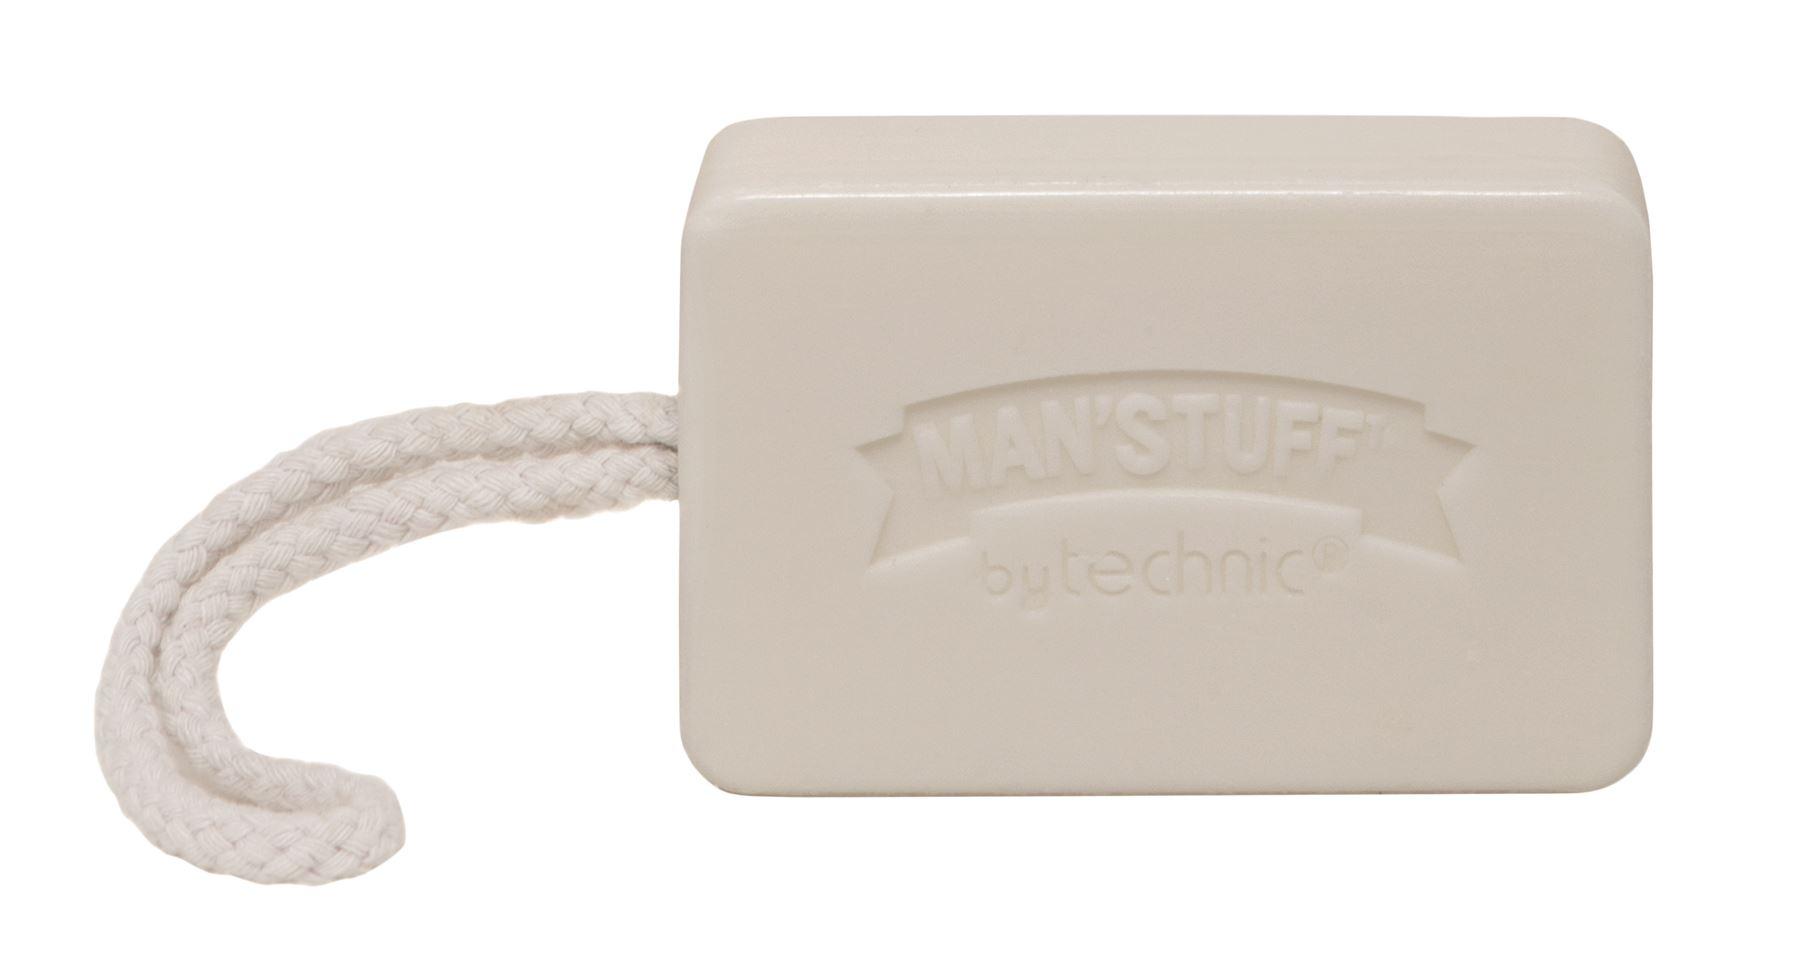 Technic-Man-039-Stuff-Men-039-s-Bath-amp-Body-Toiletry-Gift-Sets-Christmas-Xmas-Gifts thumbnail 13